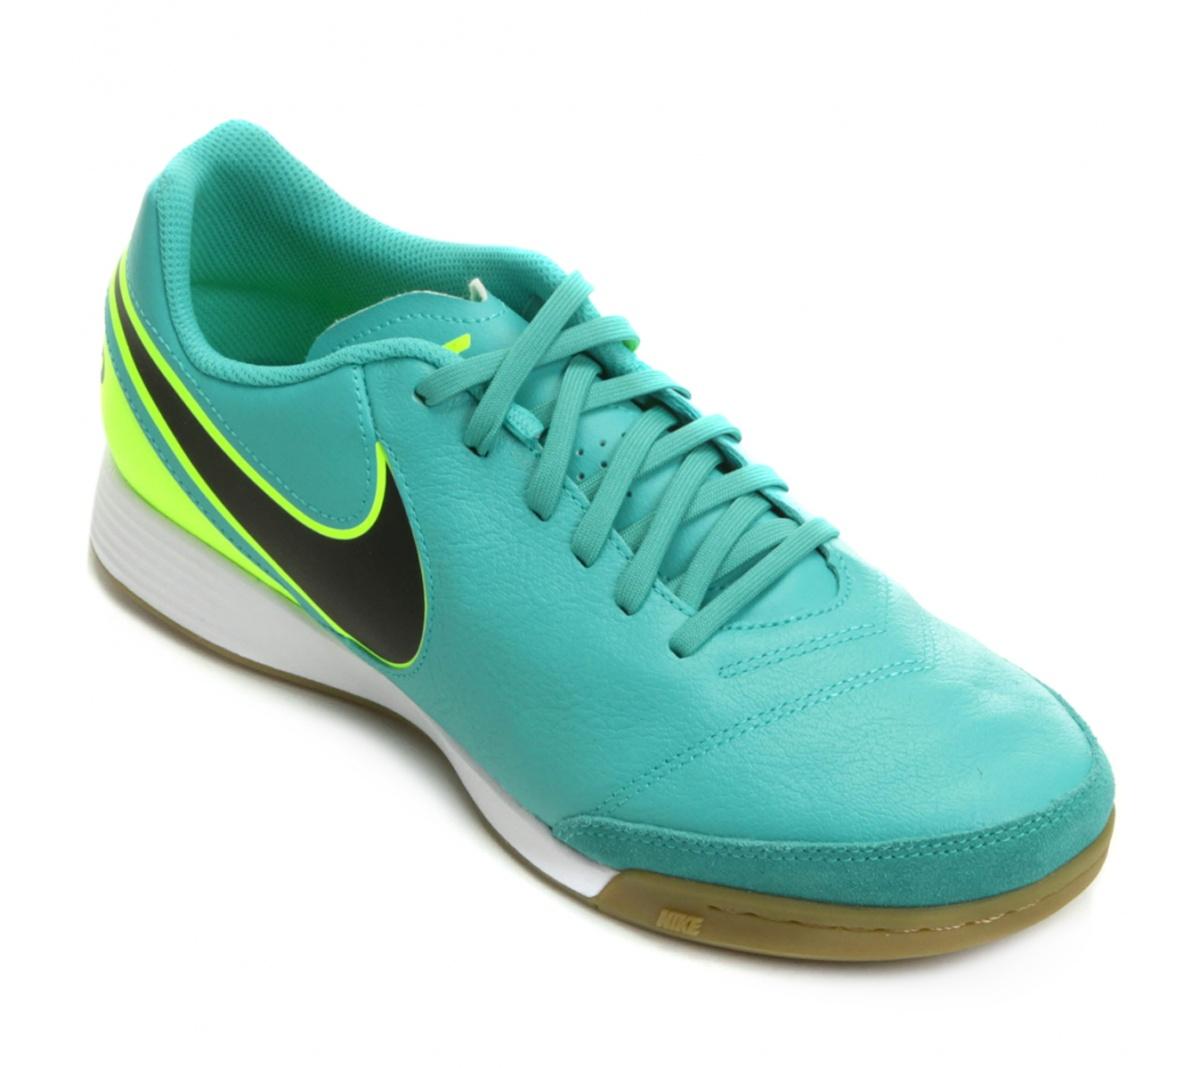 save off 0e012 53cf5 ... Tênis Nike Tiempo Genio II Leather IC ...